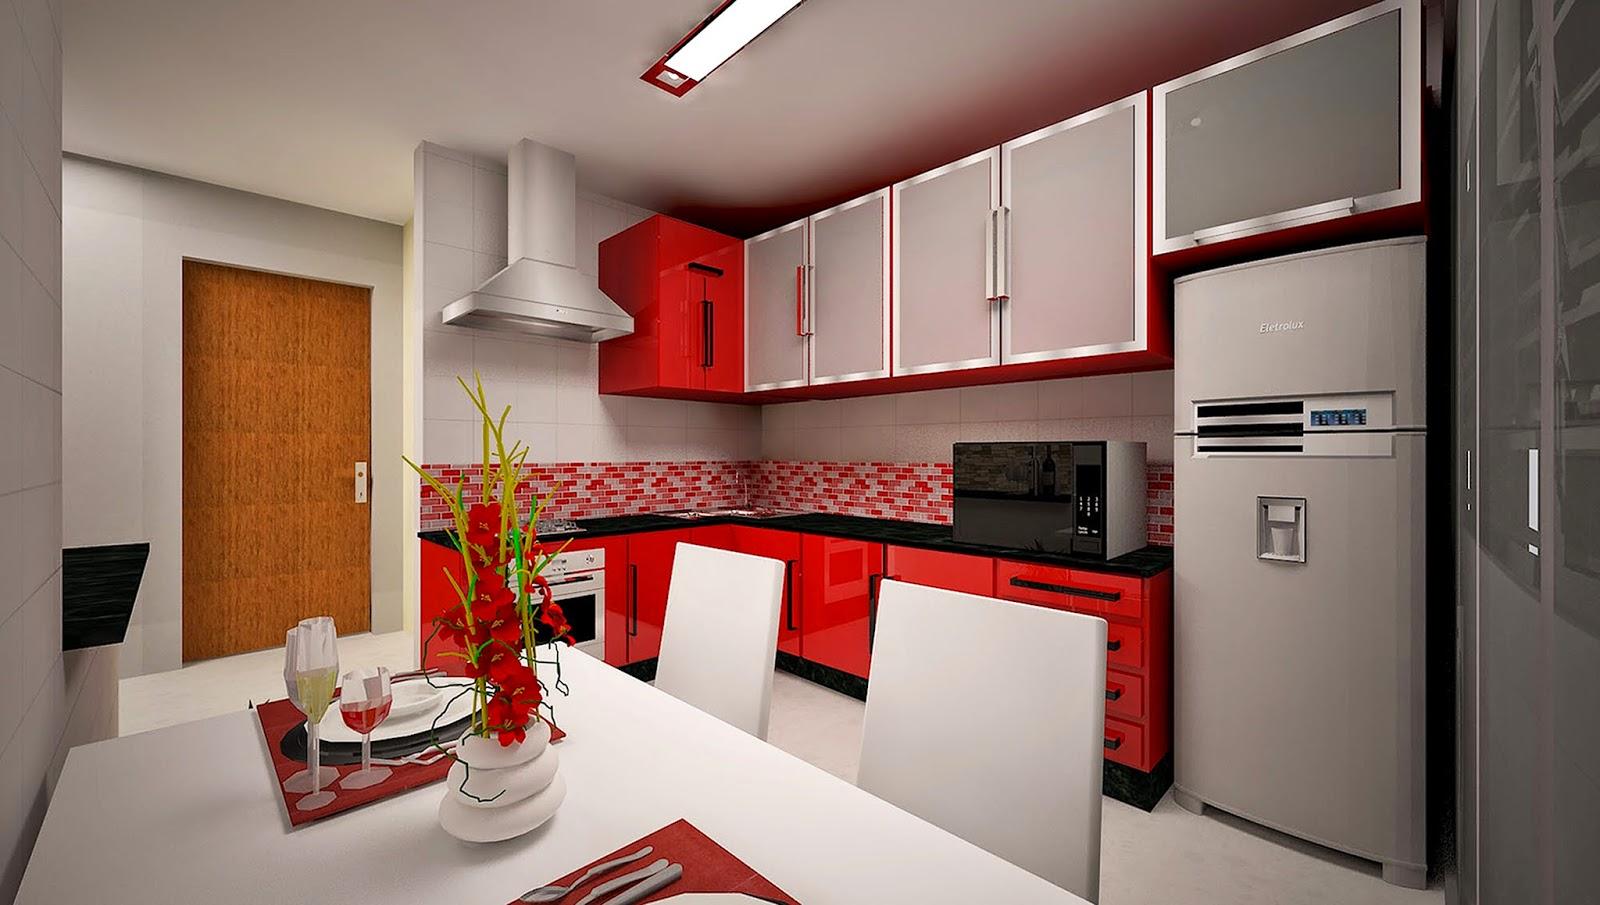 Elaine Dellaqua Projetos de Interiores e Maquetes 3D: Projeto cozinha  #B91612 1600 905